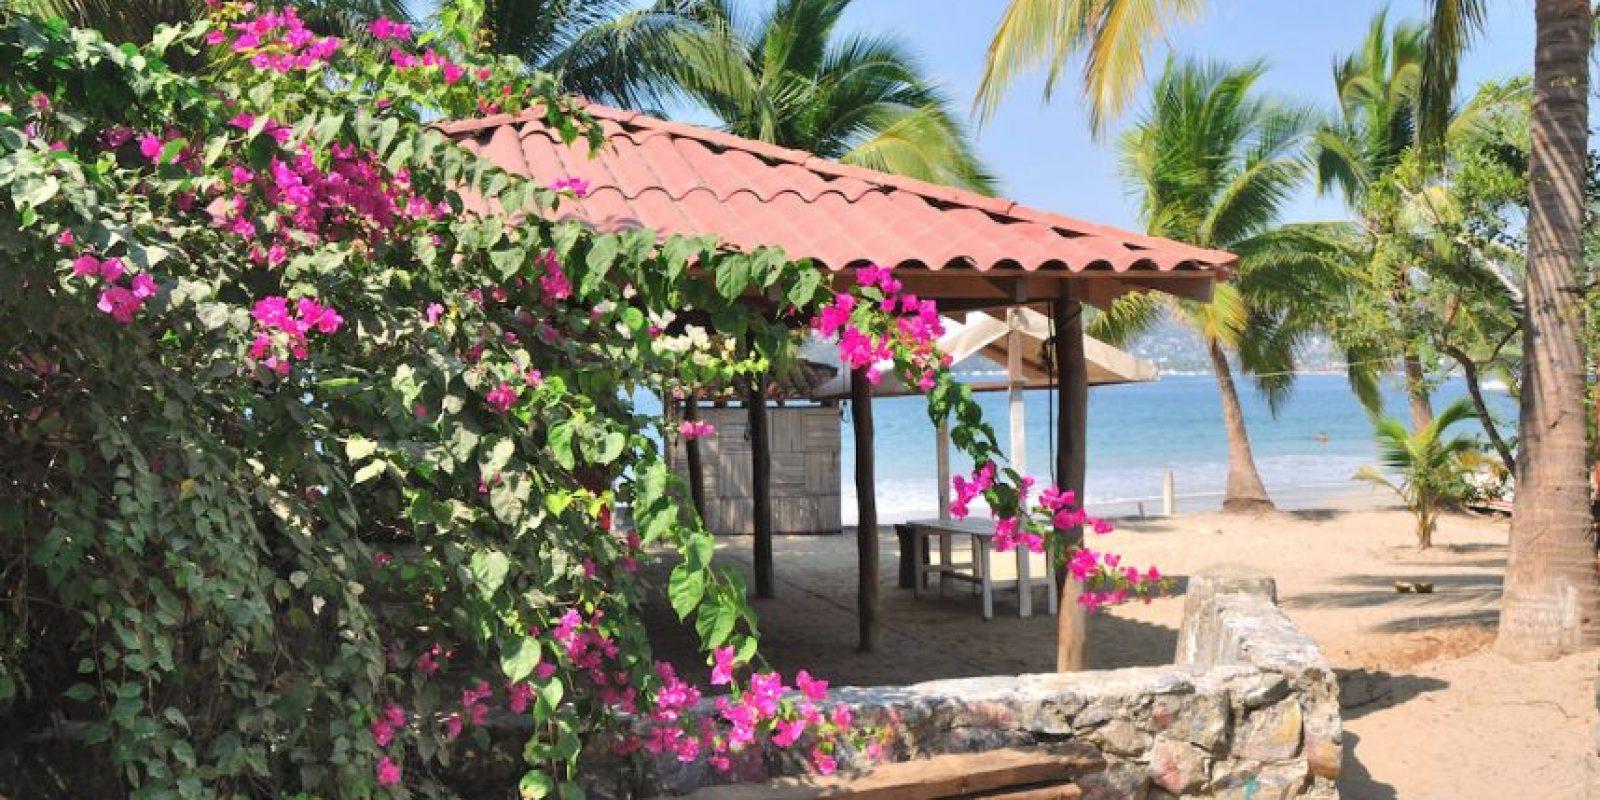 Playa La Ropa (Zihuatanejo) Foto:Dreamstime